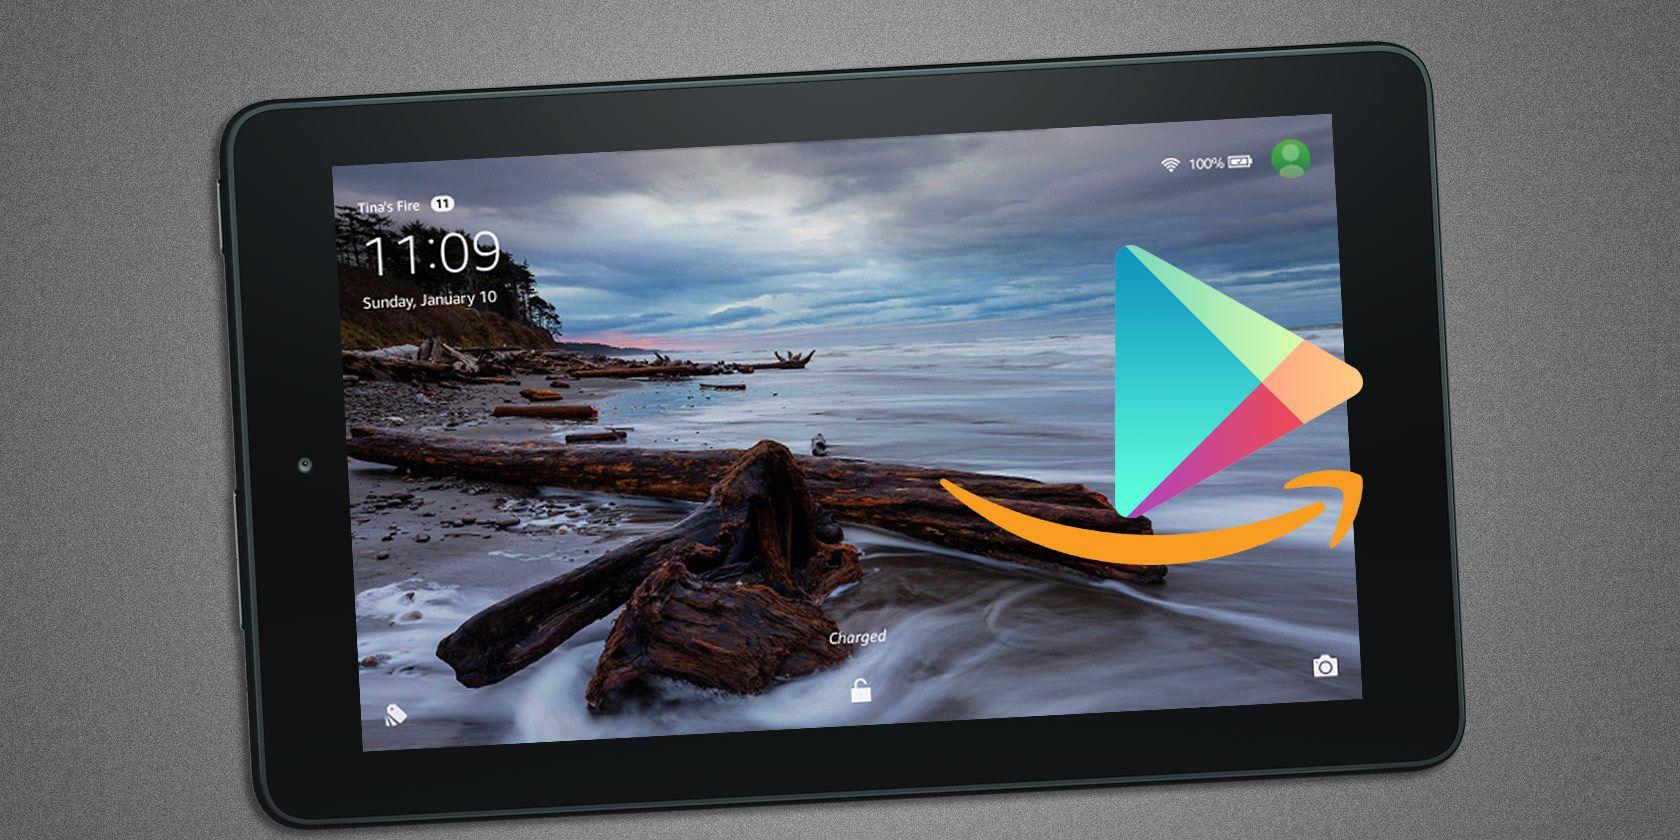 f6b3844bce9575baa636b109b2dc99c2 - How To Get Rid Of Ads On Fire Tablet 7